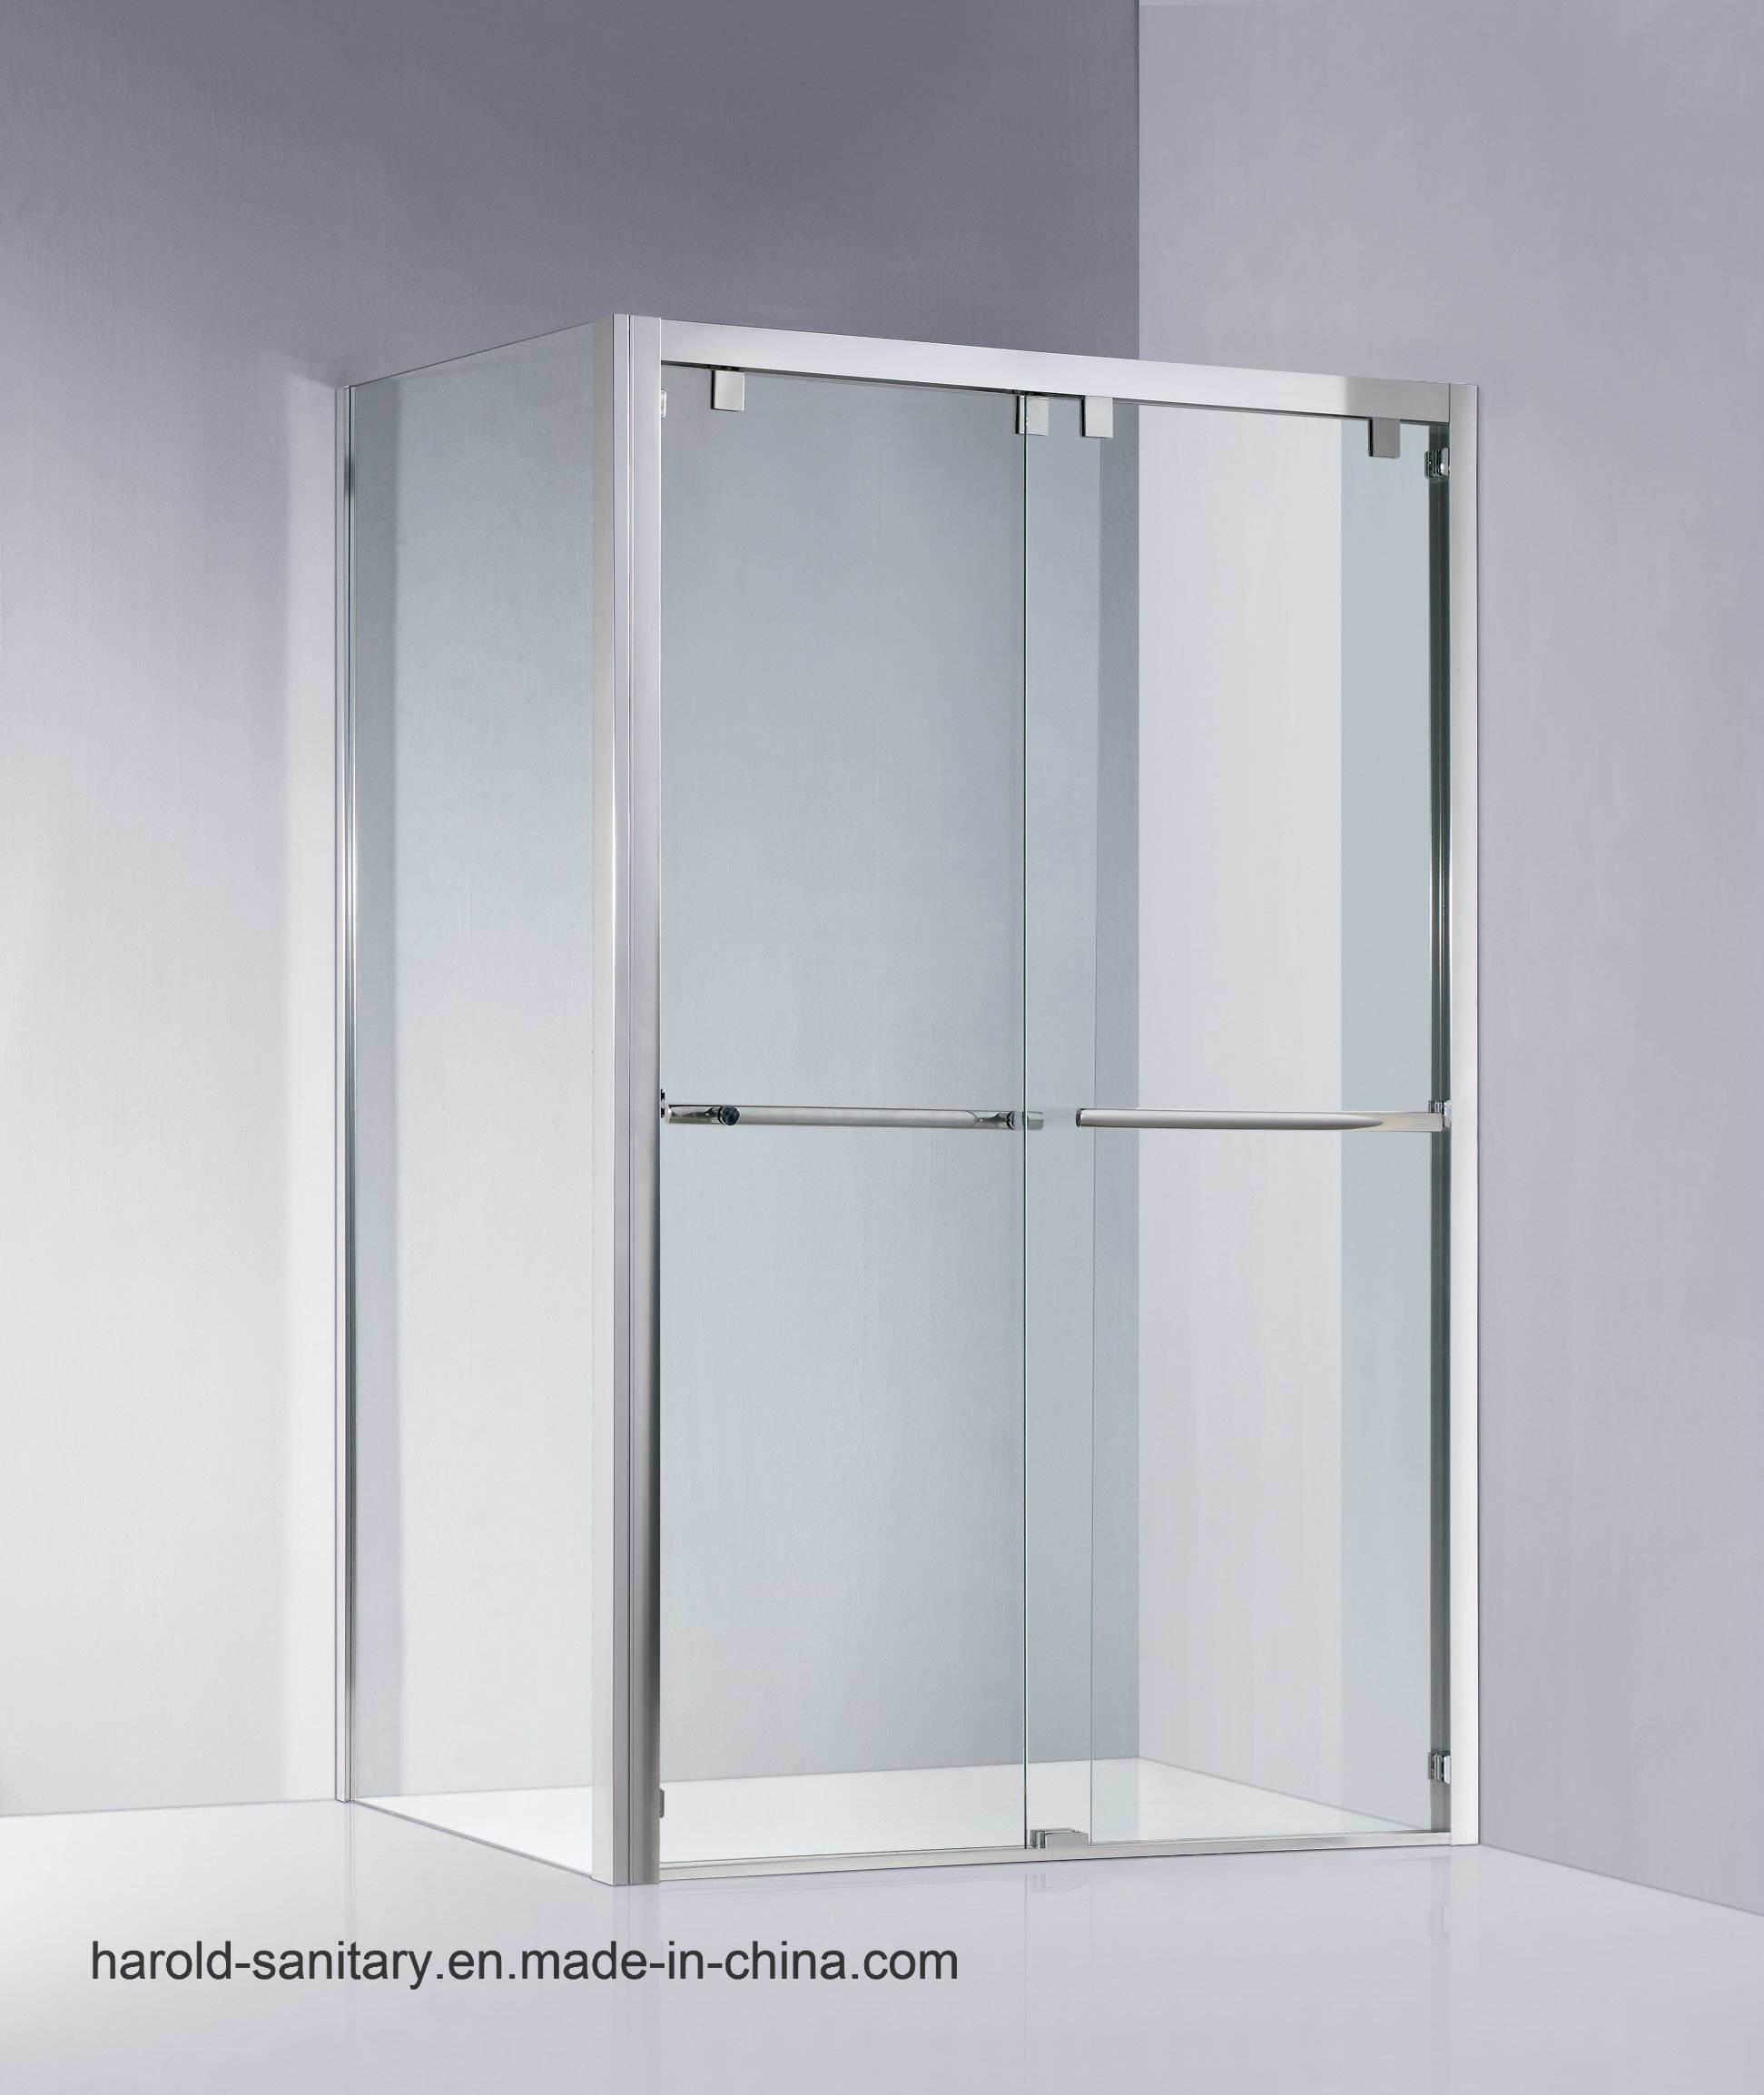 China Aluminum Framed Hanging Bypass Sliding Shower Enclosure System